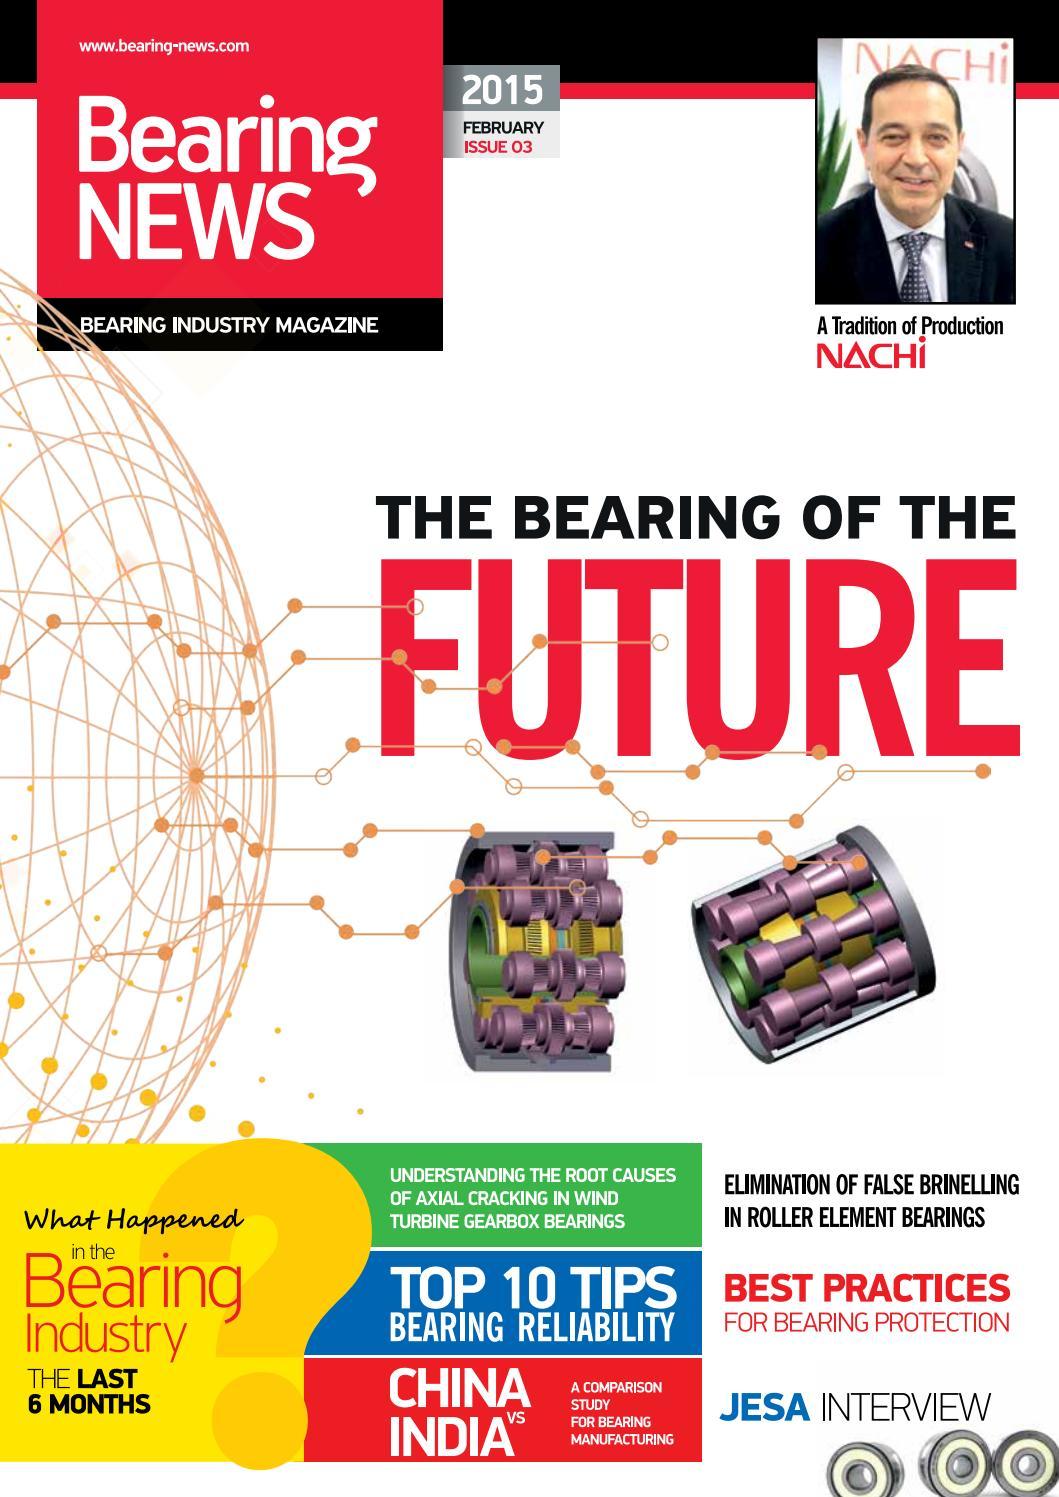 Bearingnews Magazine February 2015 Issue By Bearing Newscom Issuu Samurai Alternator Wiring Diagram On Centrifugal Fan